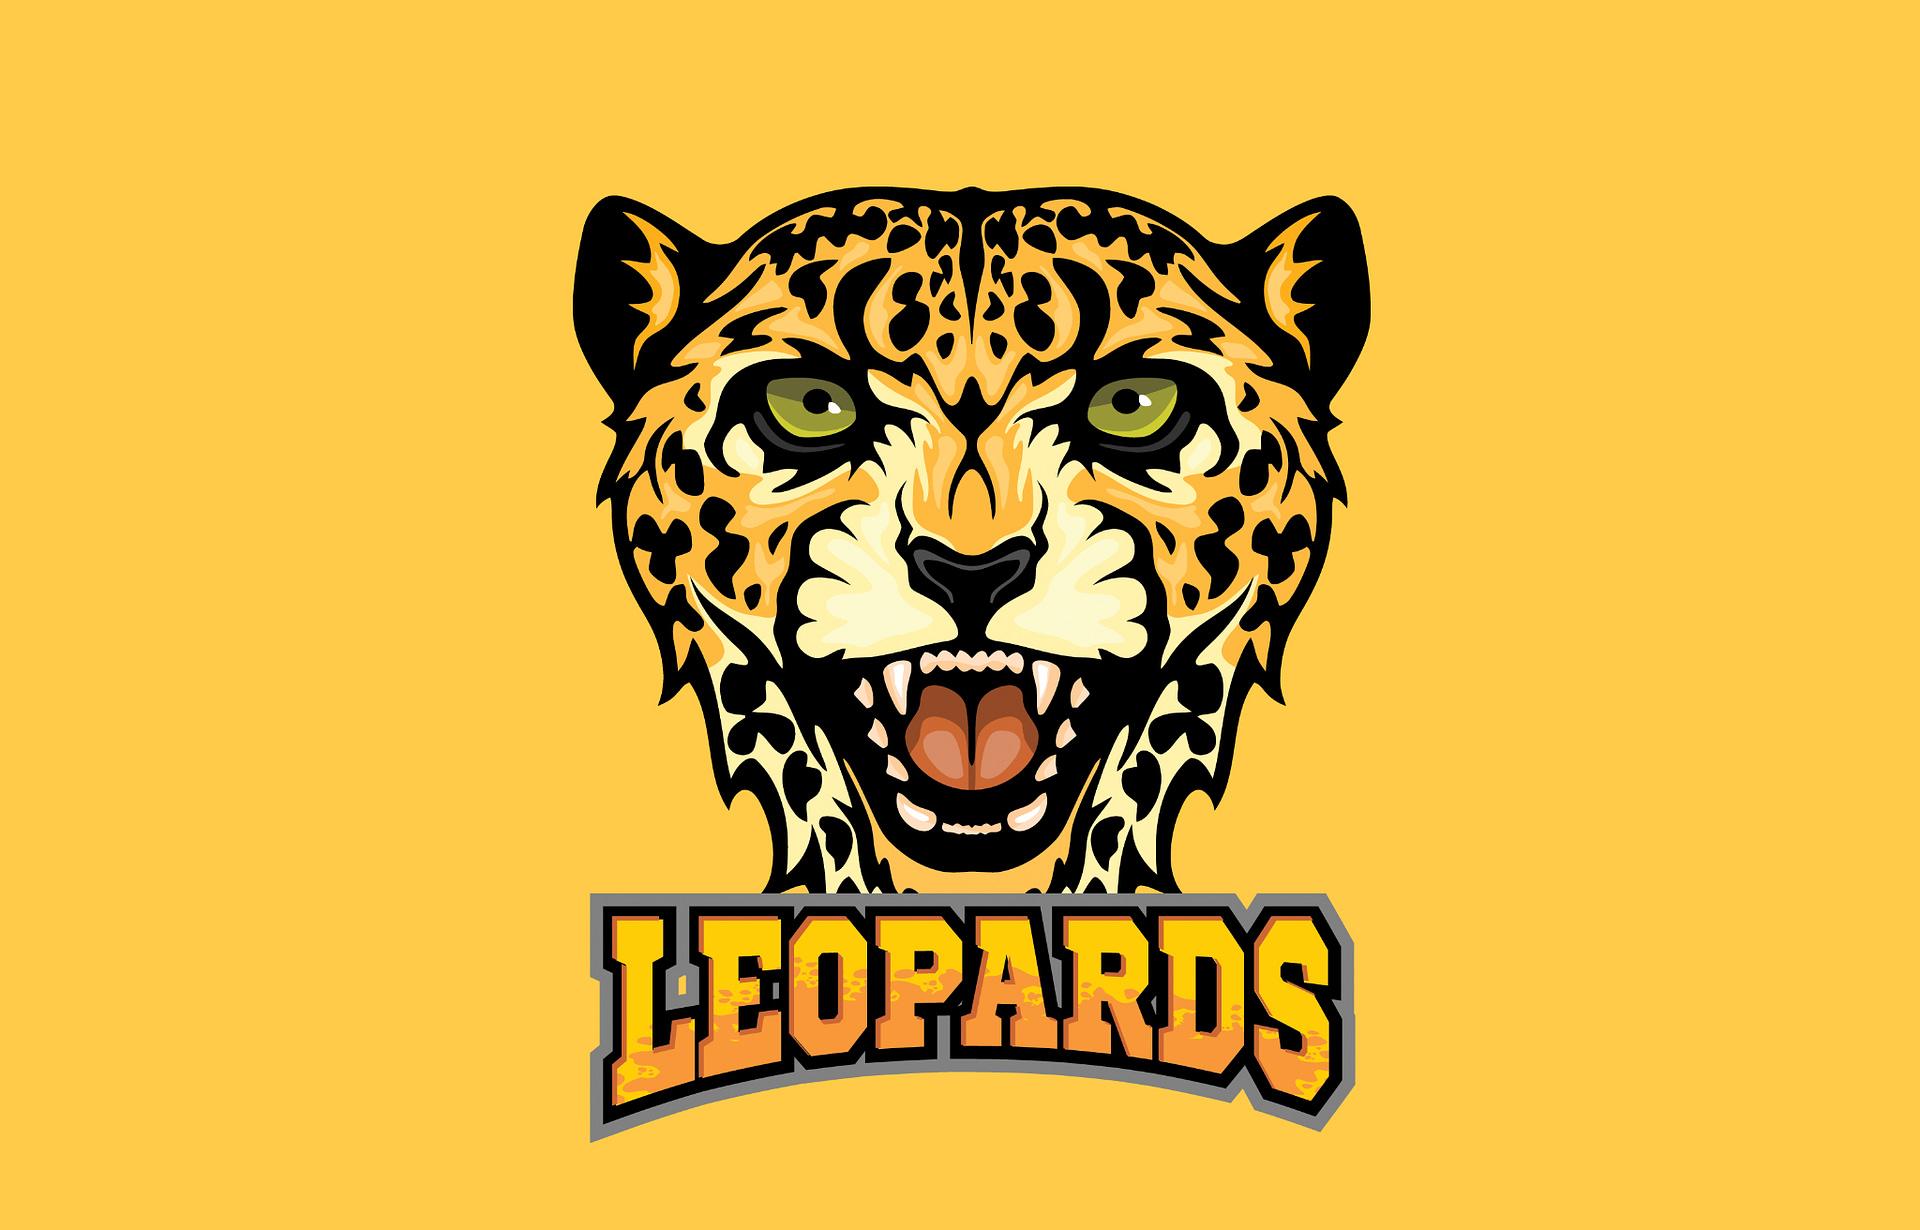 Legacy FC Leopards